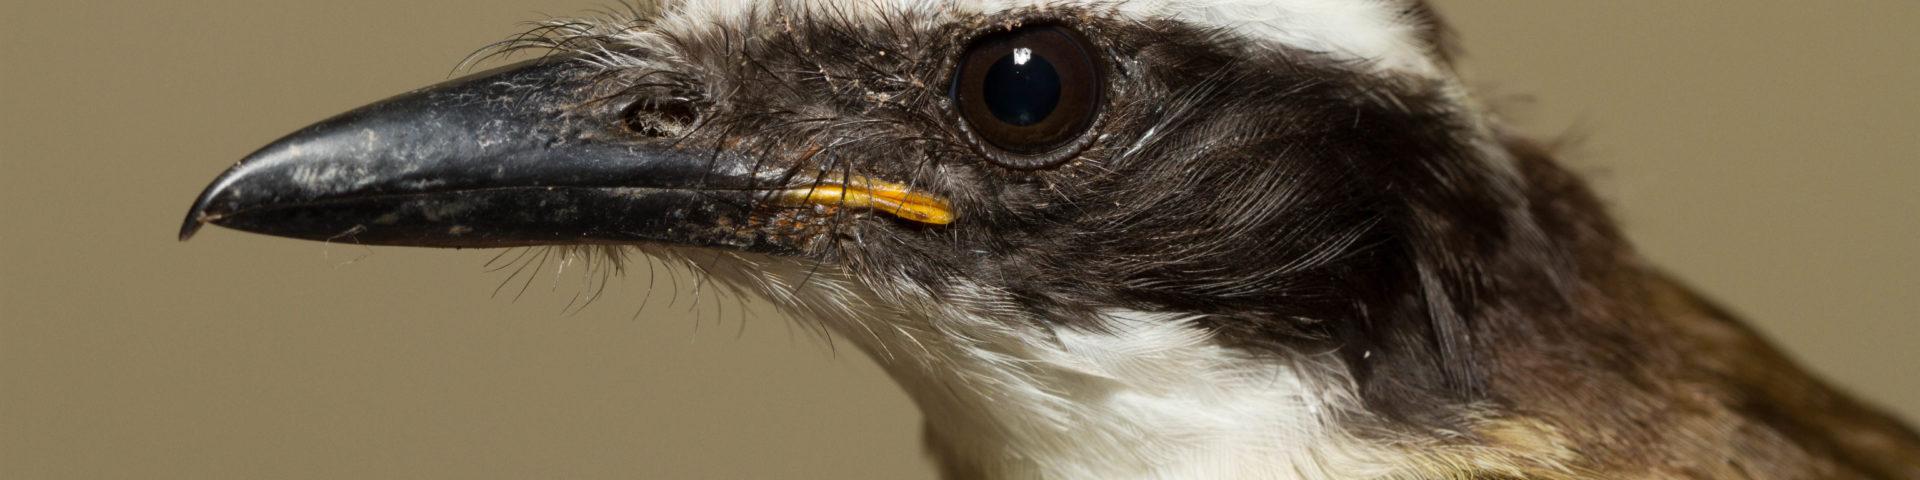 Brown/black bird with white stripe across eye